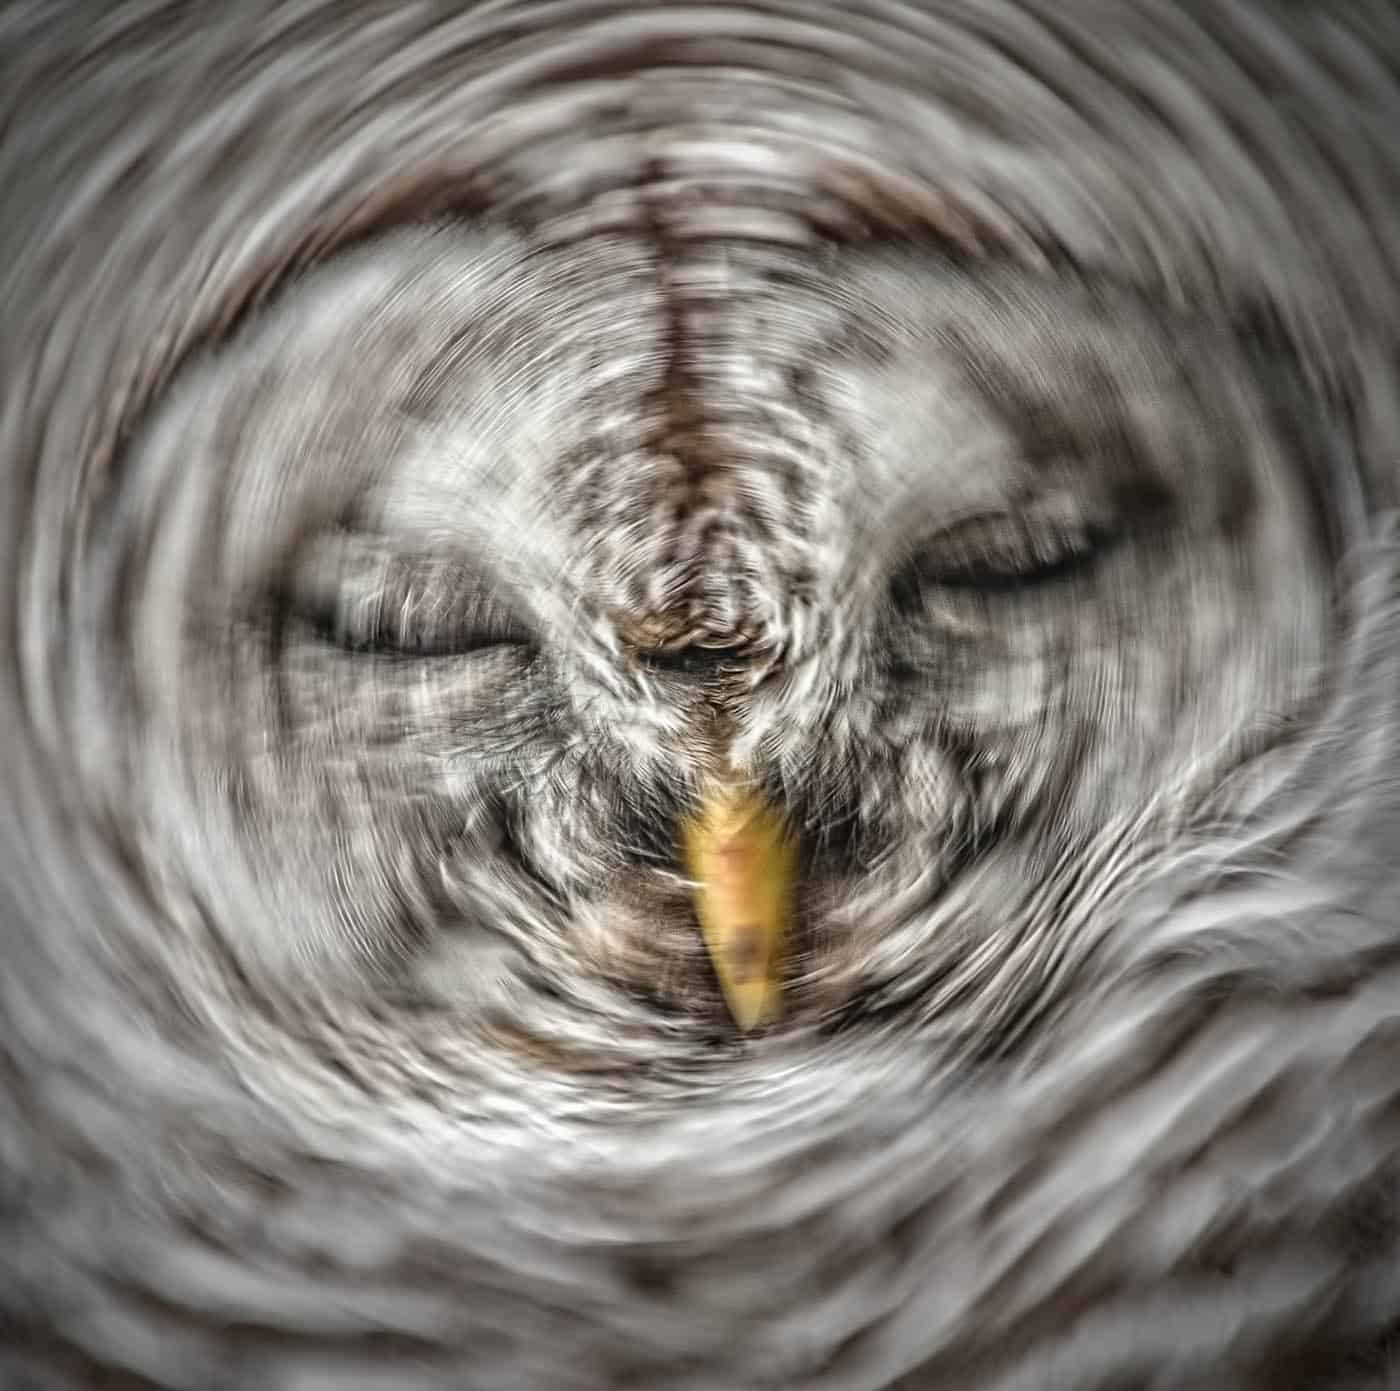 Barred Owl Head Shake